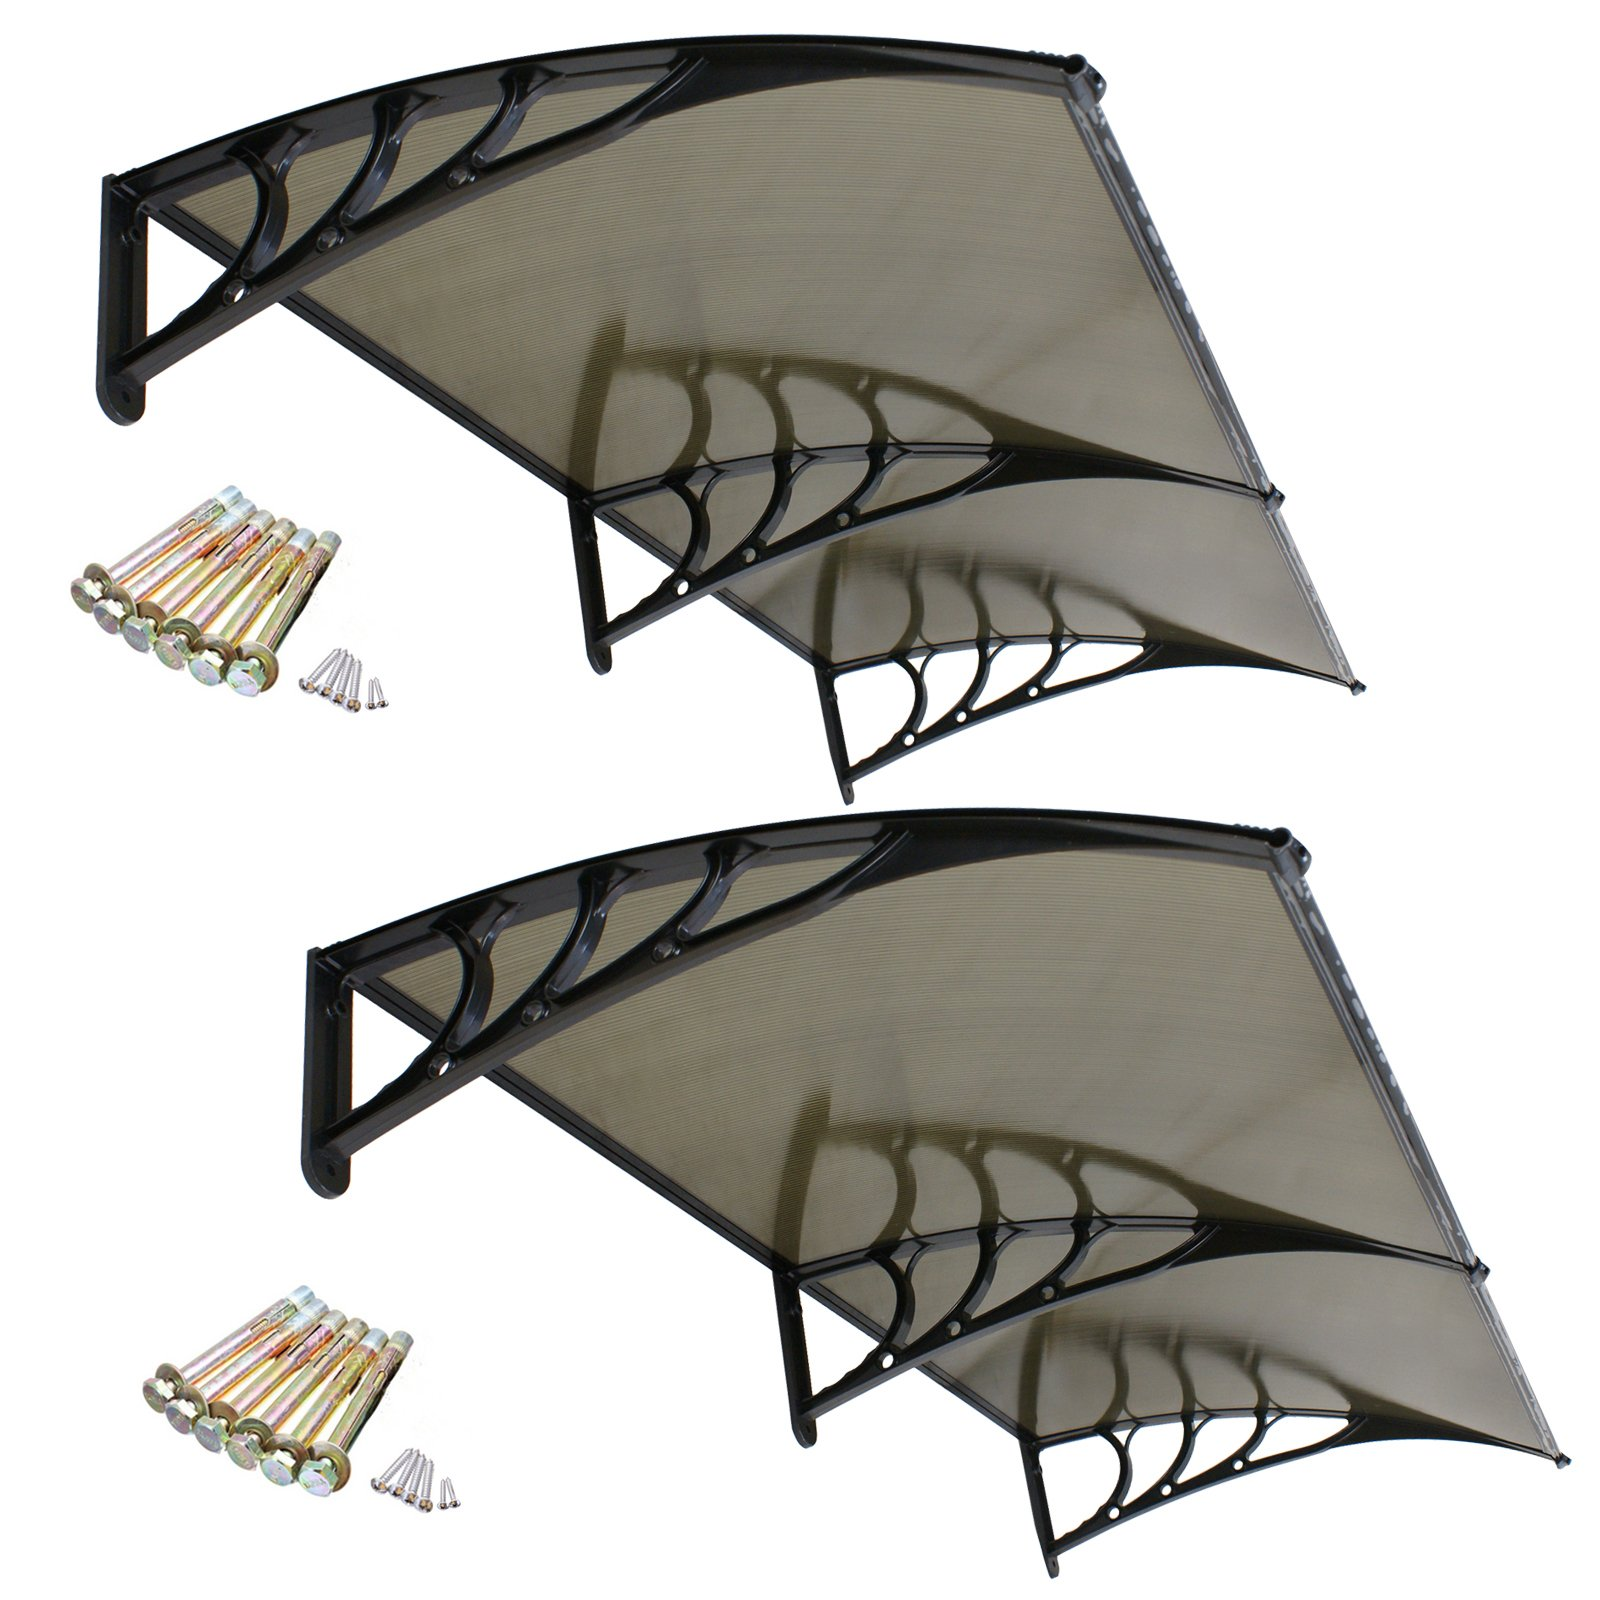 Super Deal 2PCS 40''x 80'' Overhead Door Window Outdoor Awning Door Canopy Patio Cover Modern Polycarbonate Rain Snow Protection (2PCS Yellow)